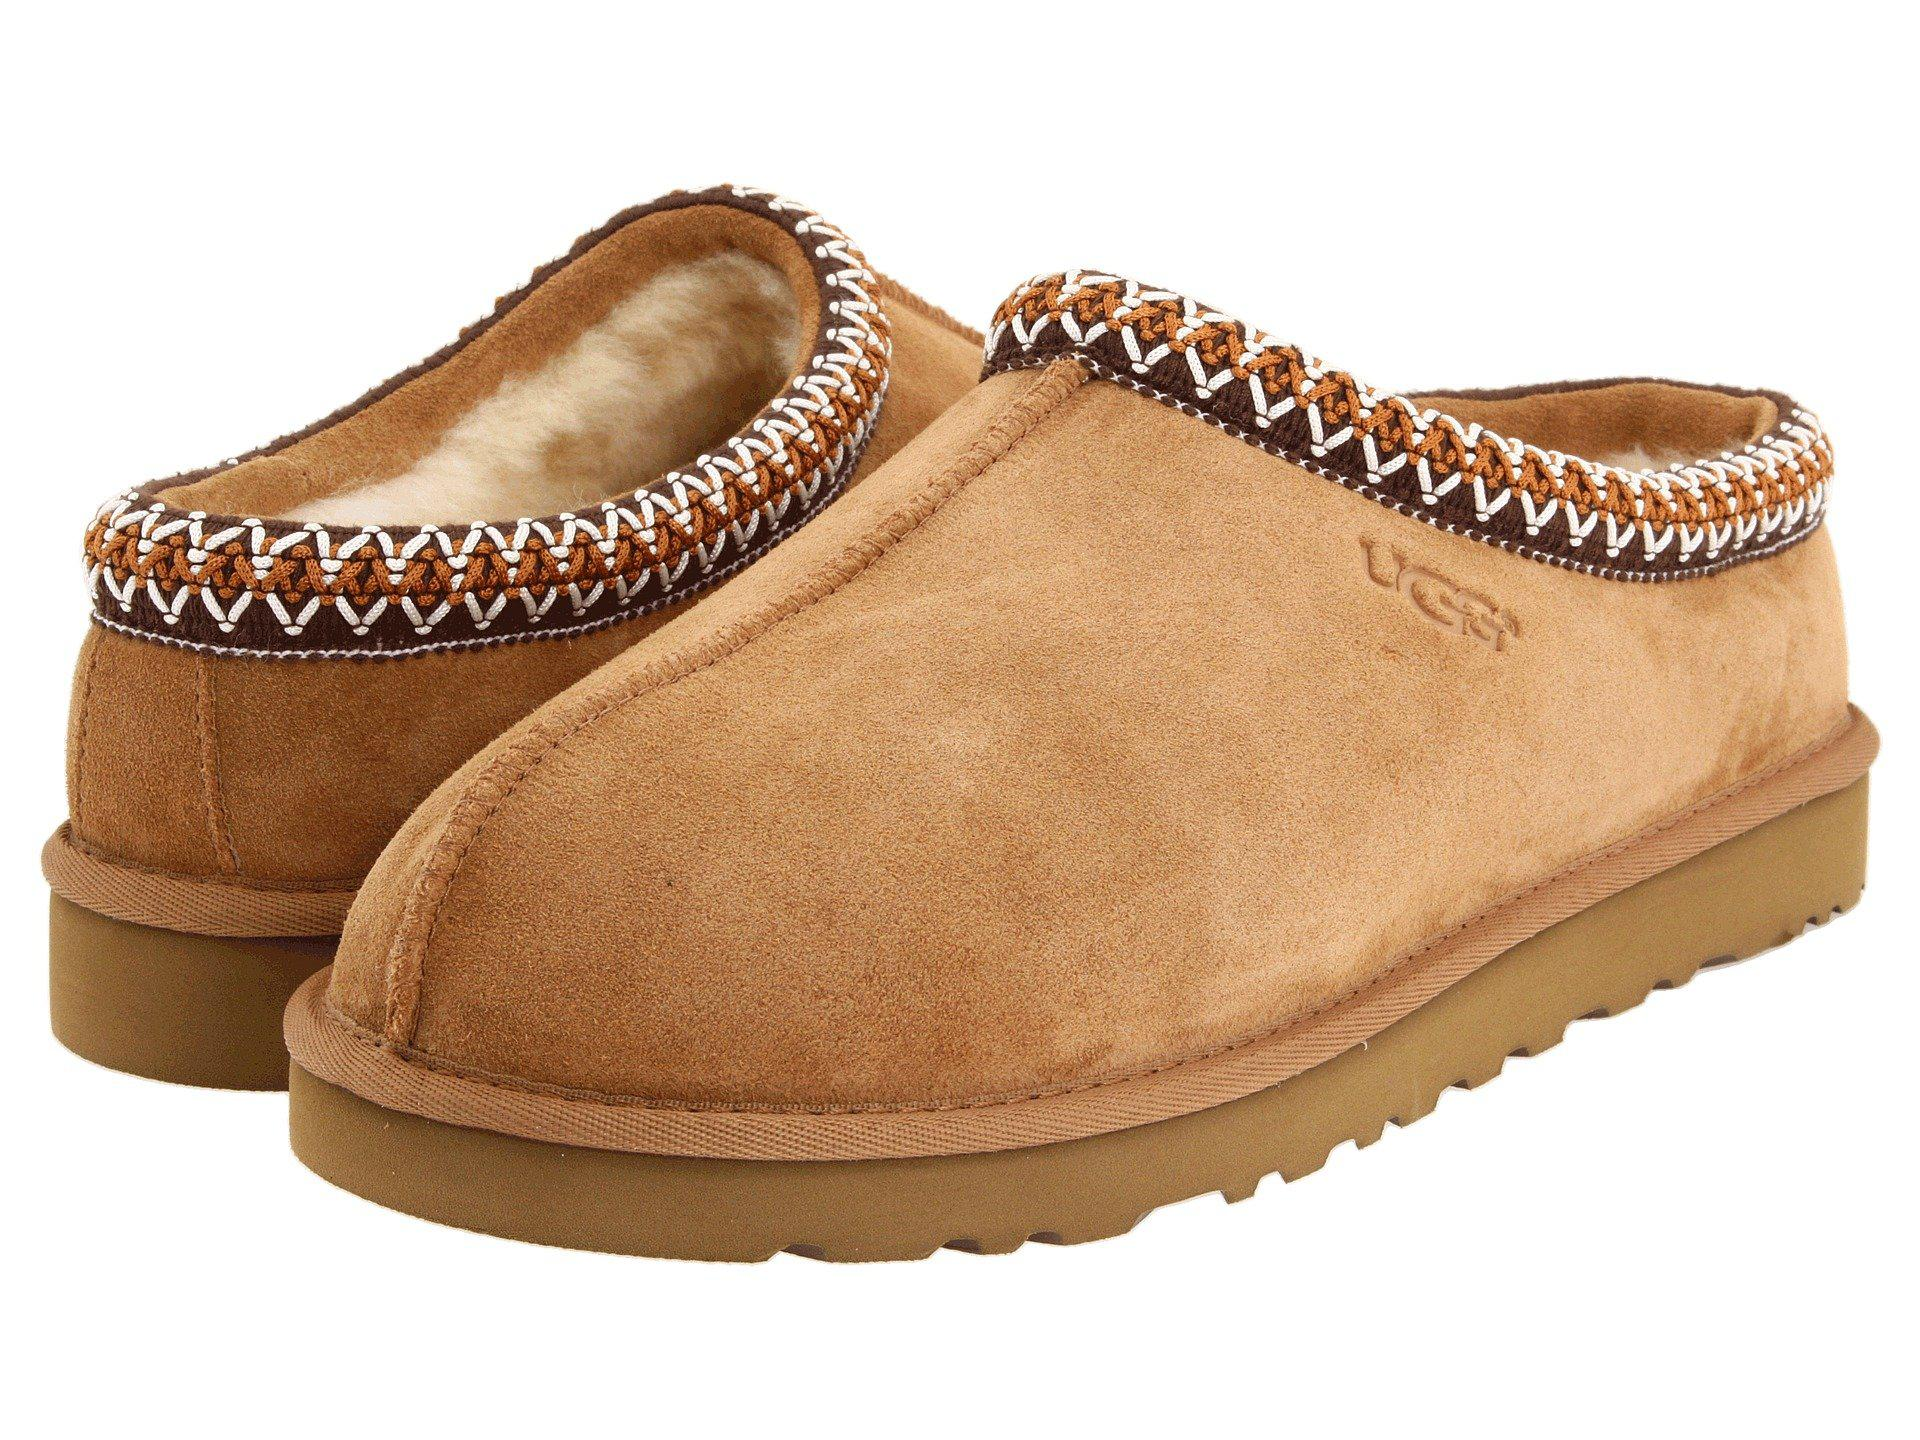 83c199e0c2dc44 Lyst - UGG Tasman (chestnut) Men s Slippers in Brown for Men - Save 1%